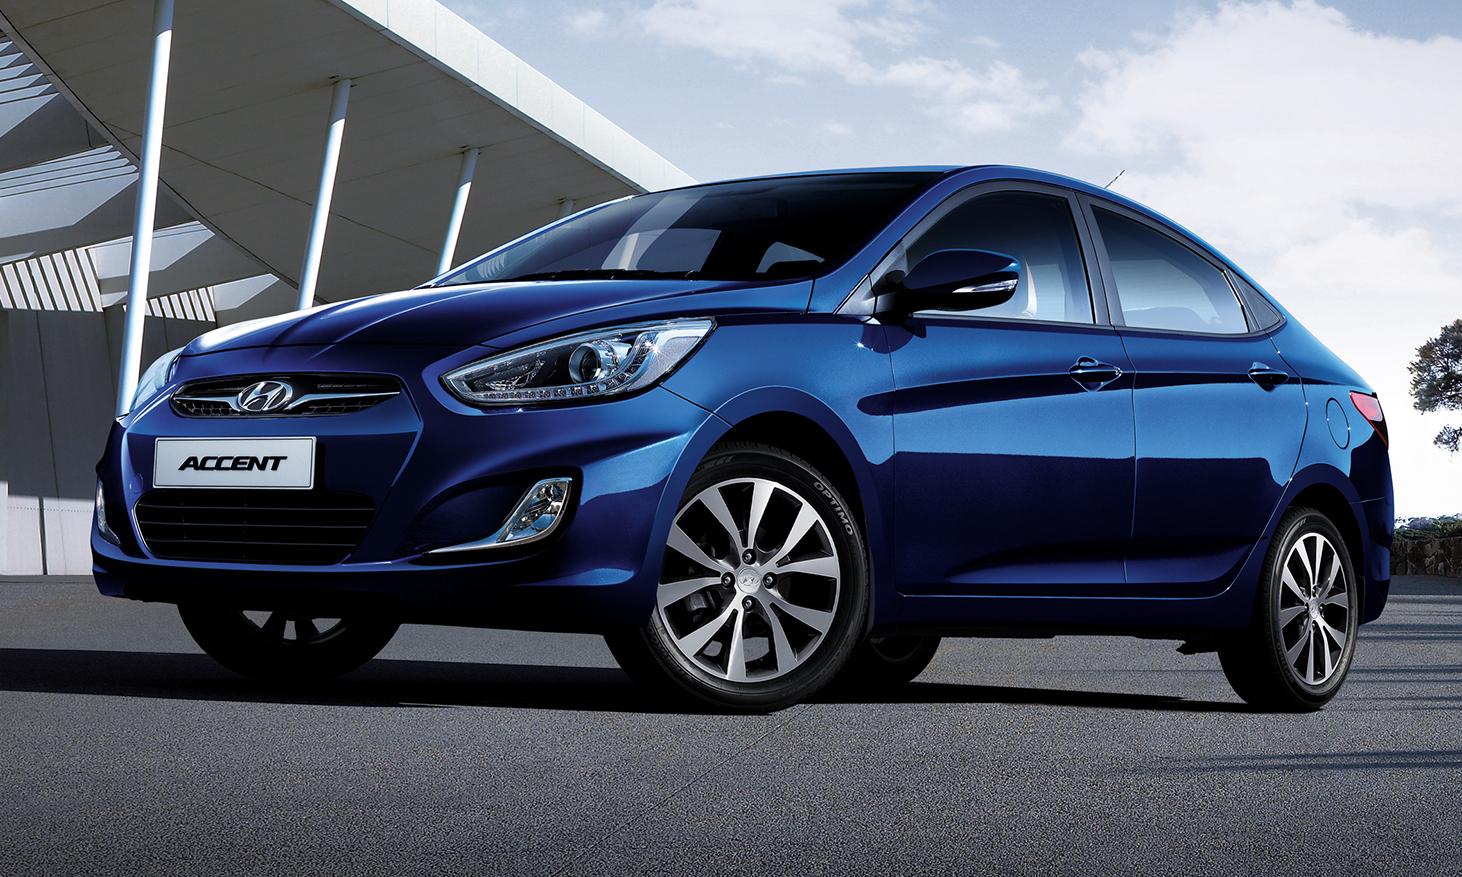 Hyundai Accent 2014 Sedan Lanzamiento: hyundai accent